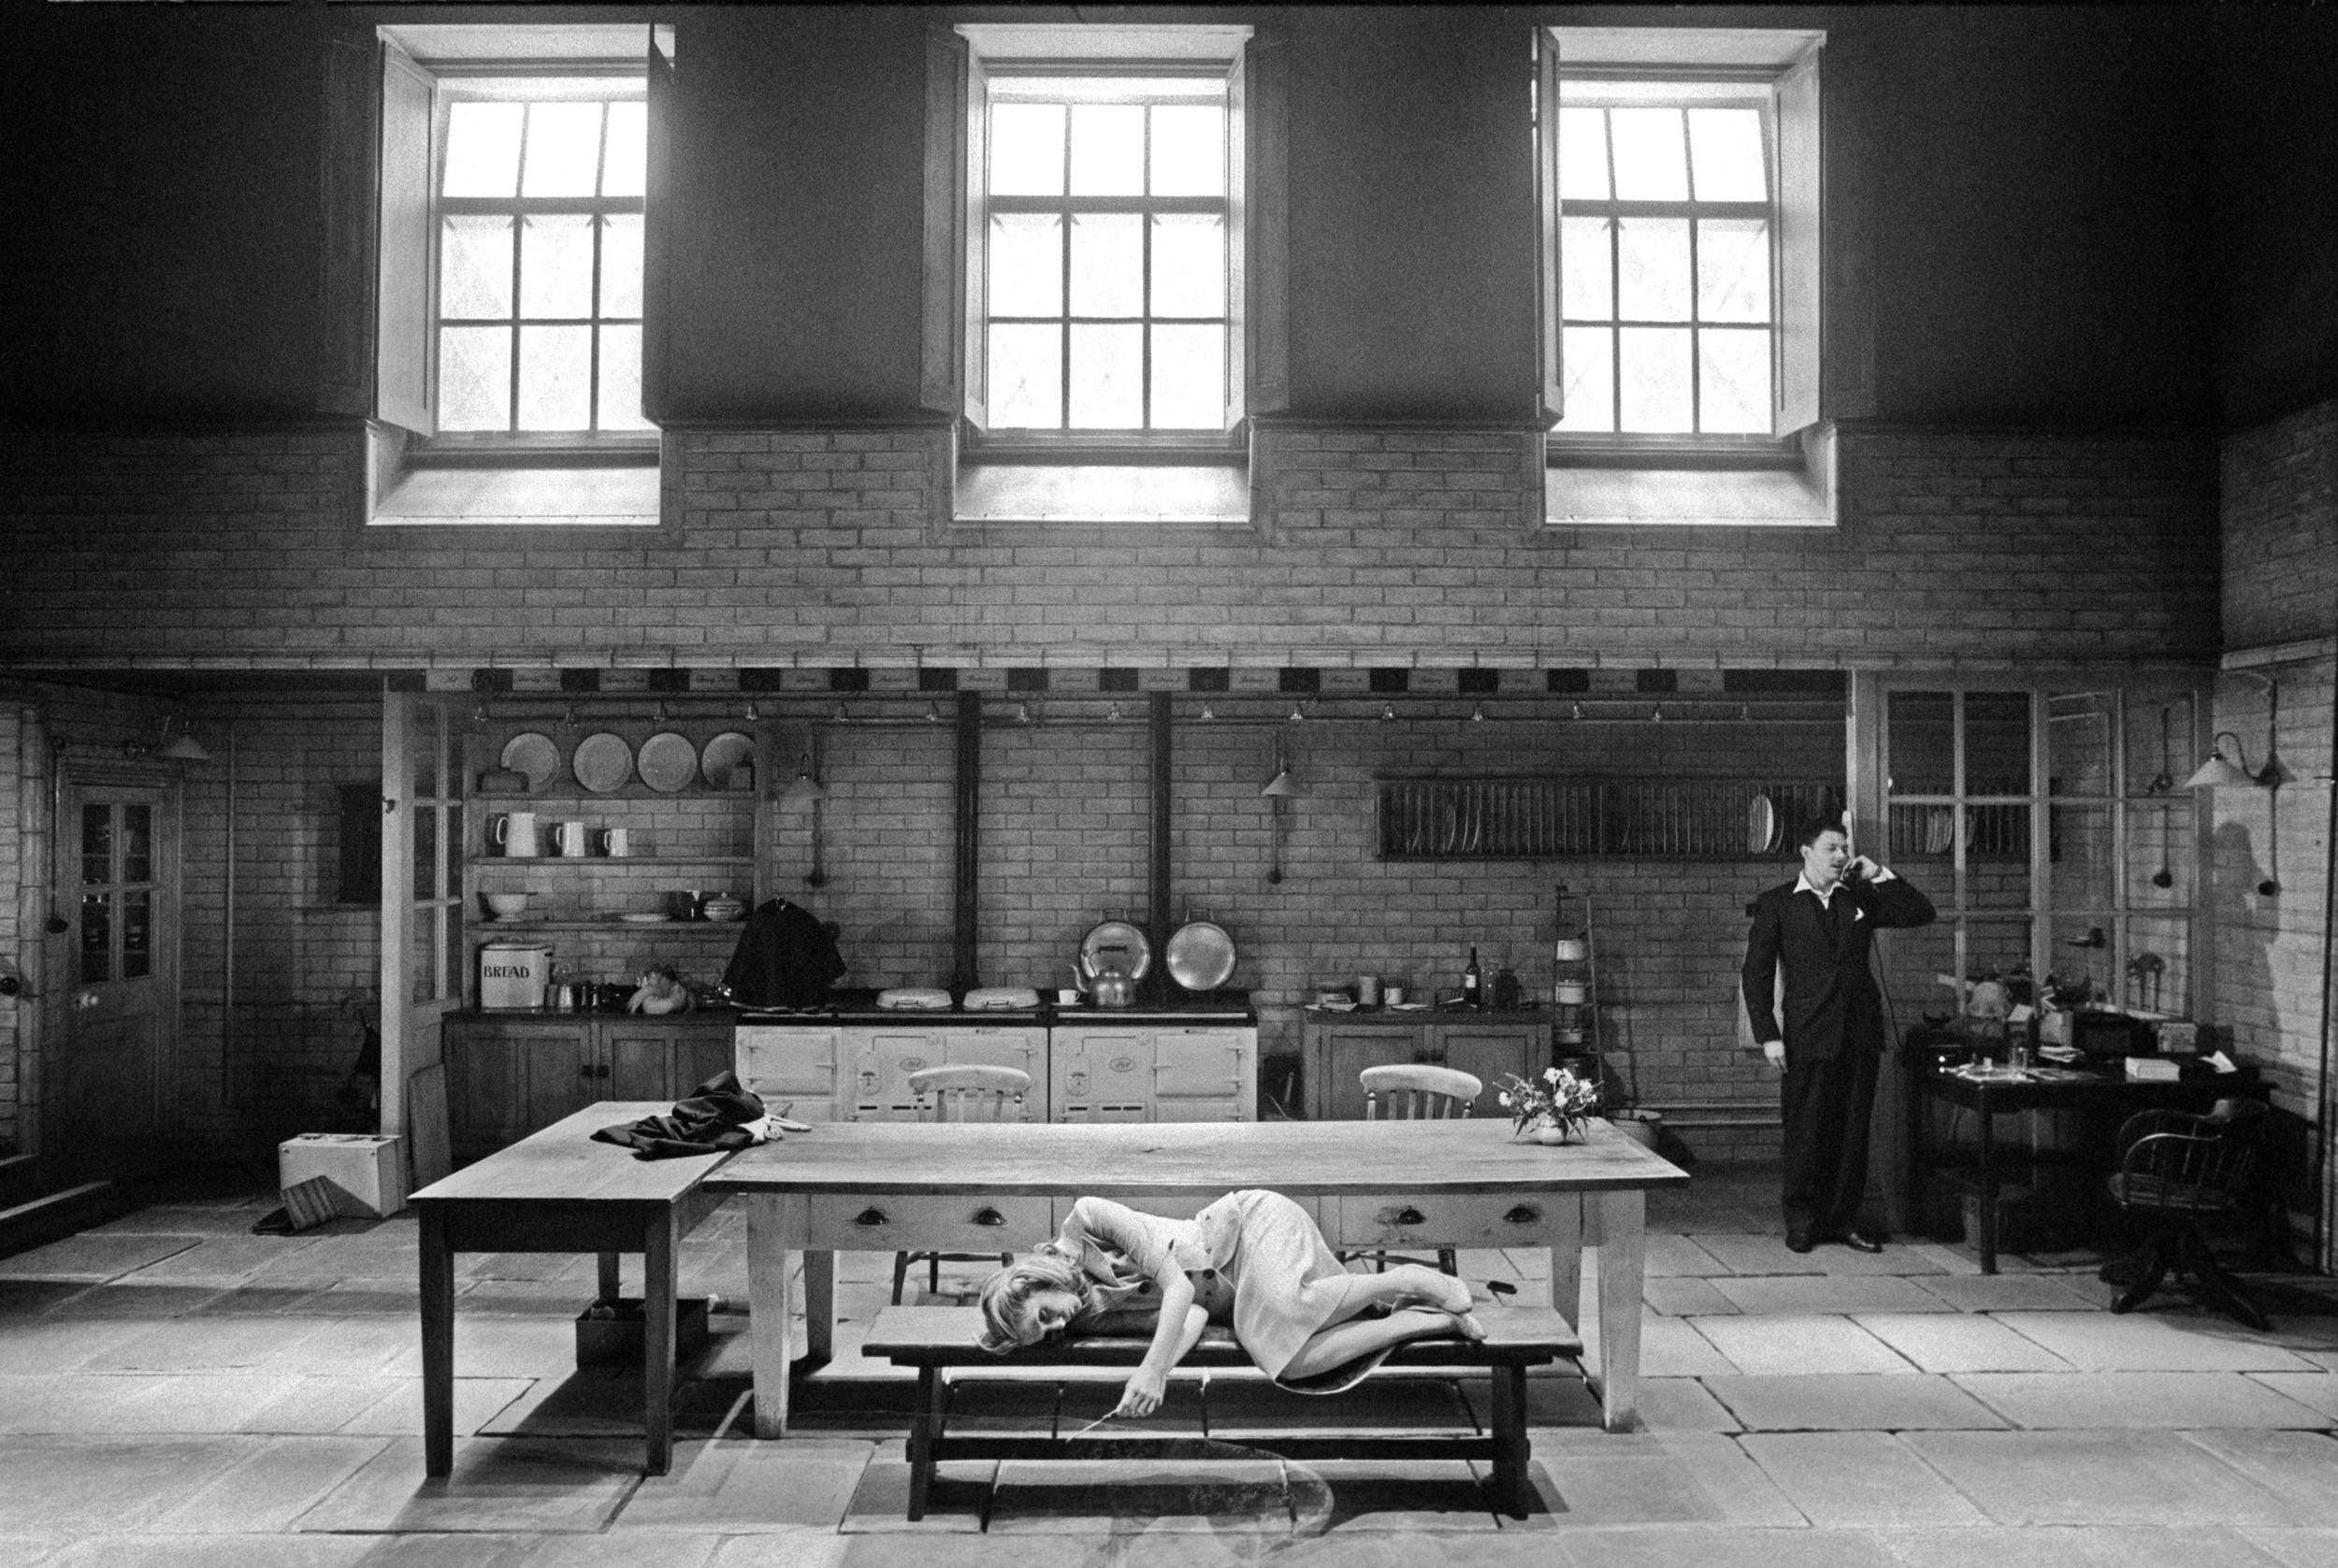 After Miss Julie-Donmar Warehouse 002.jpg